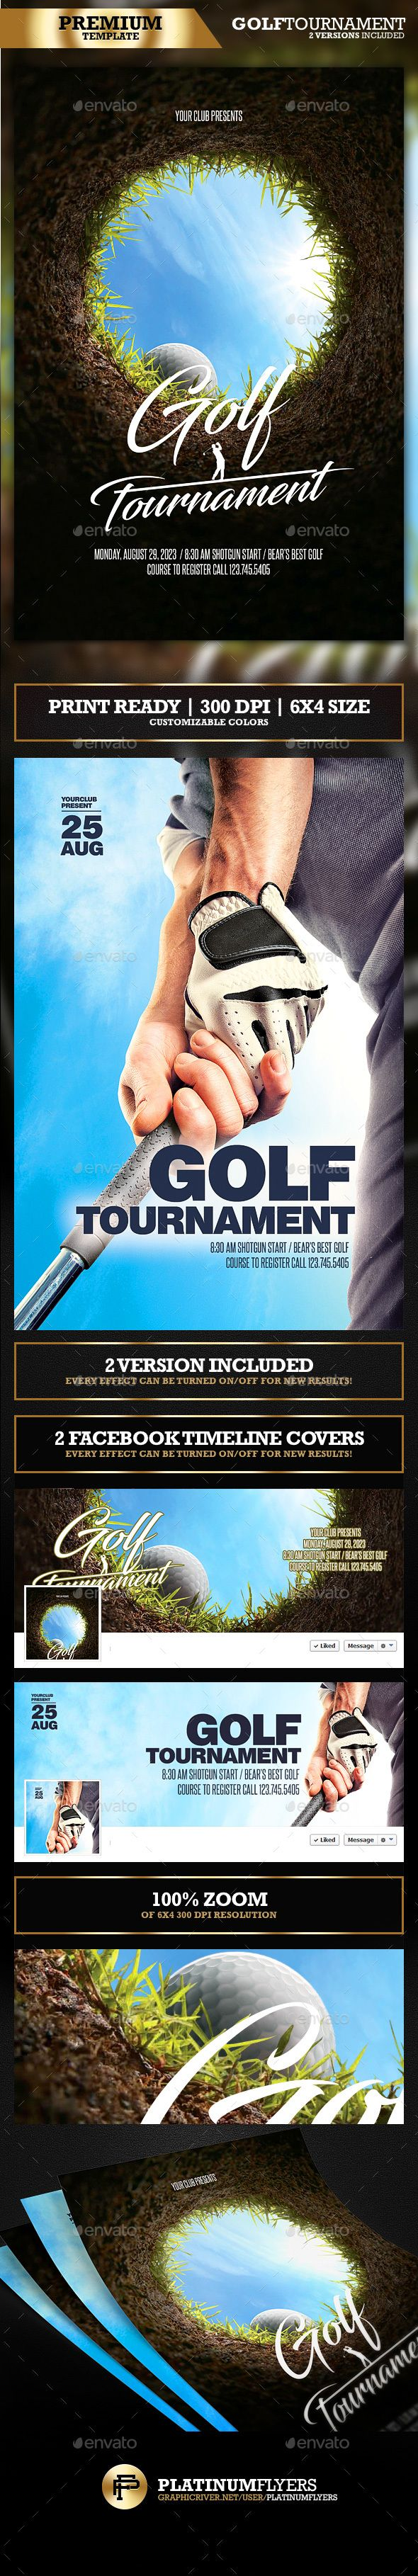 Golf Flyer / Golf Tournament (2 in 1) - Print Templates